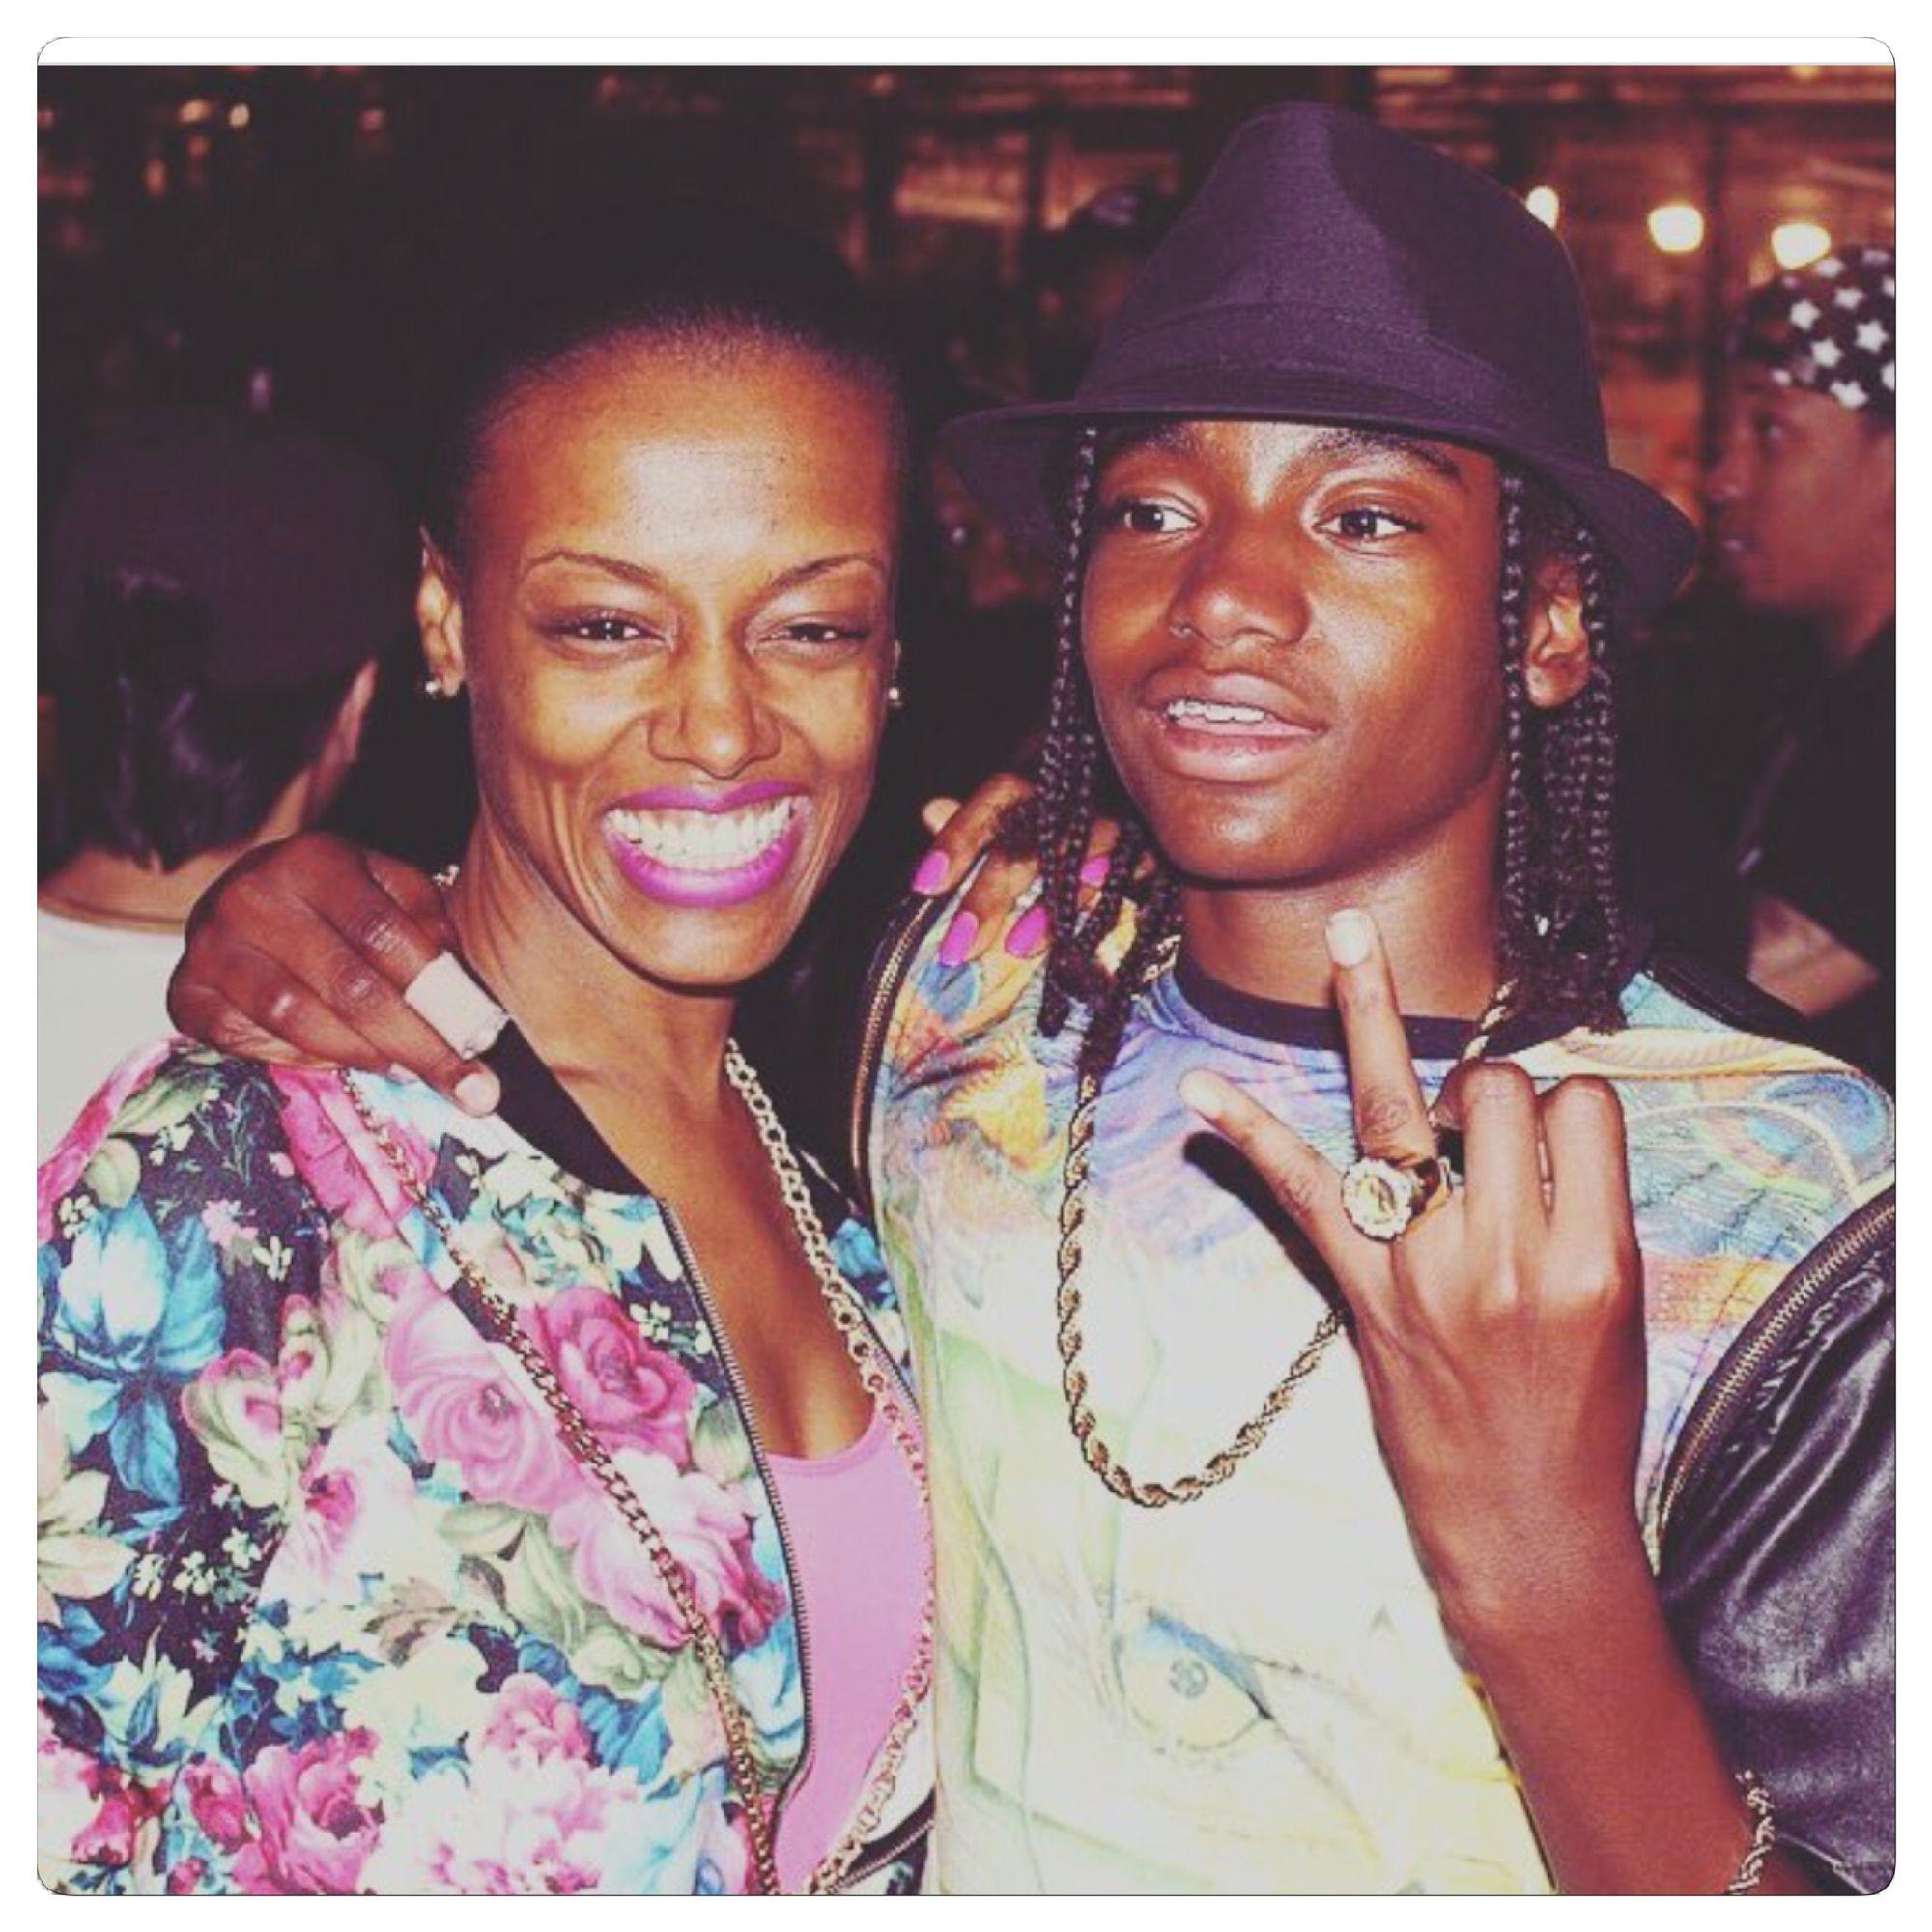 Mani winner of The Rap Game Season 2 & his mom.